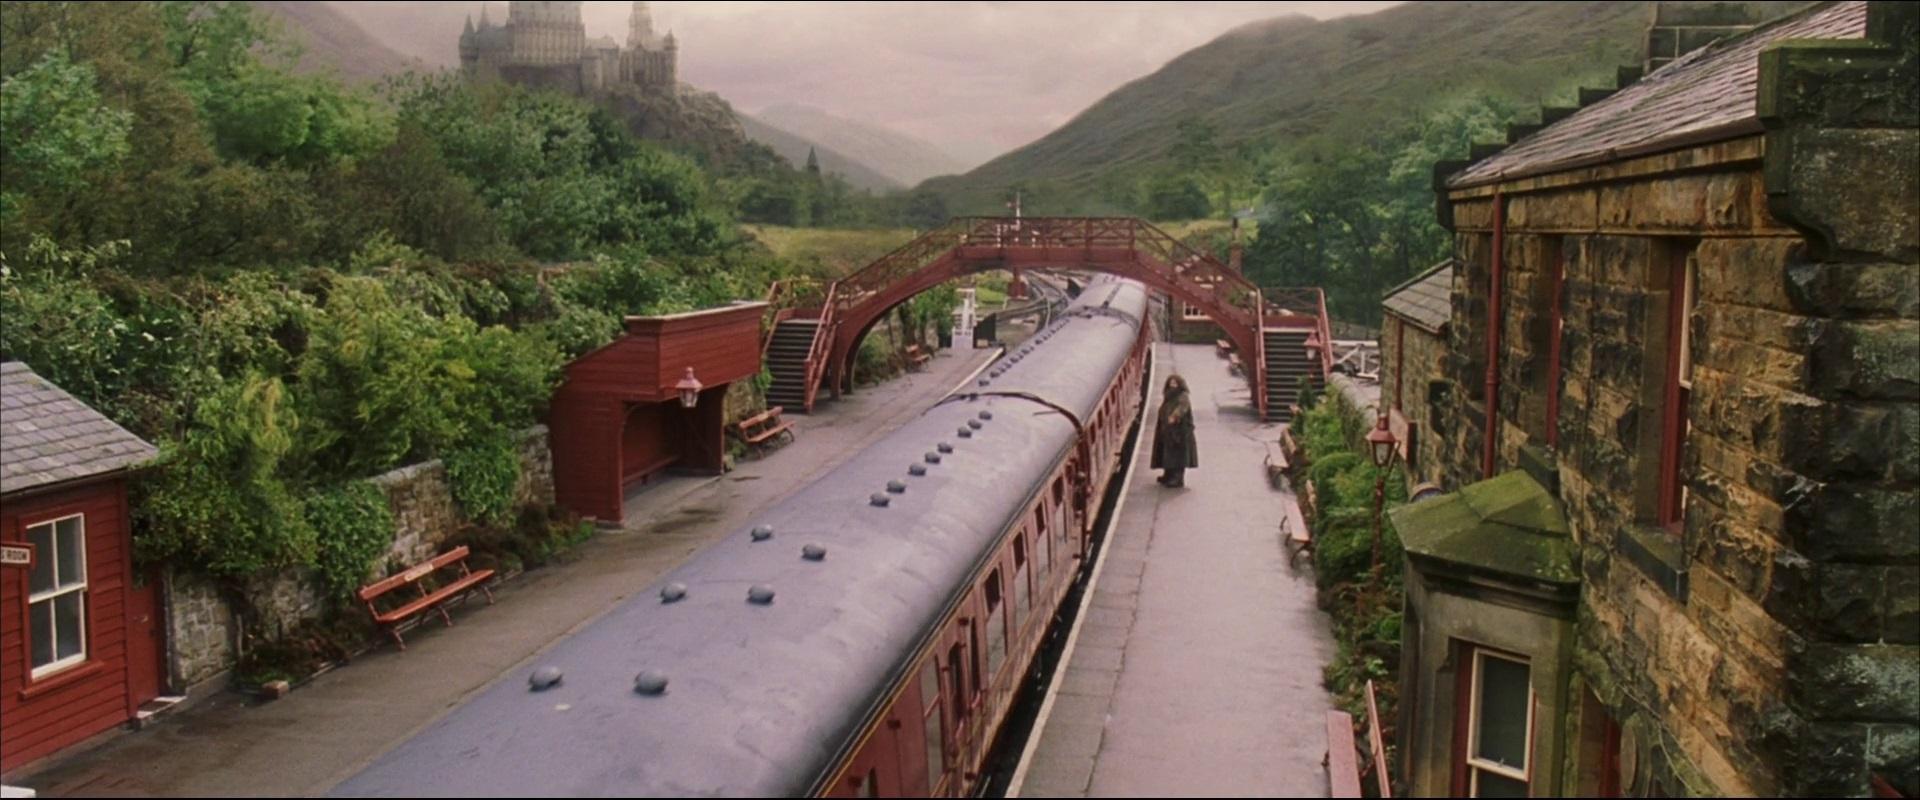 File:Hogsmeade Station.jpg